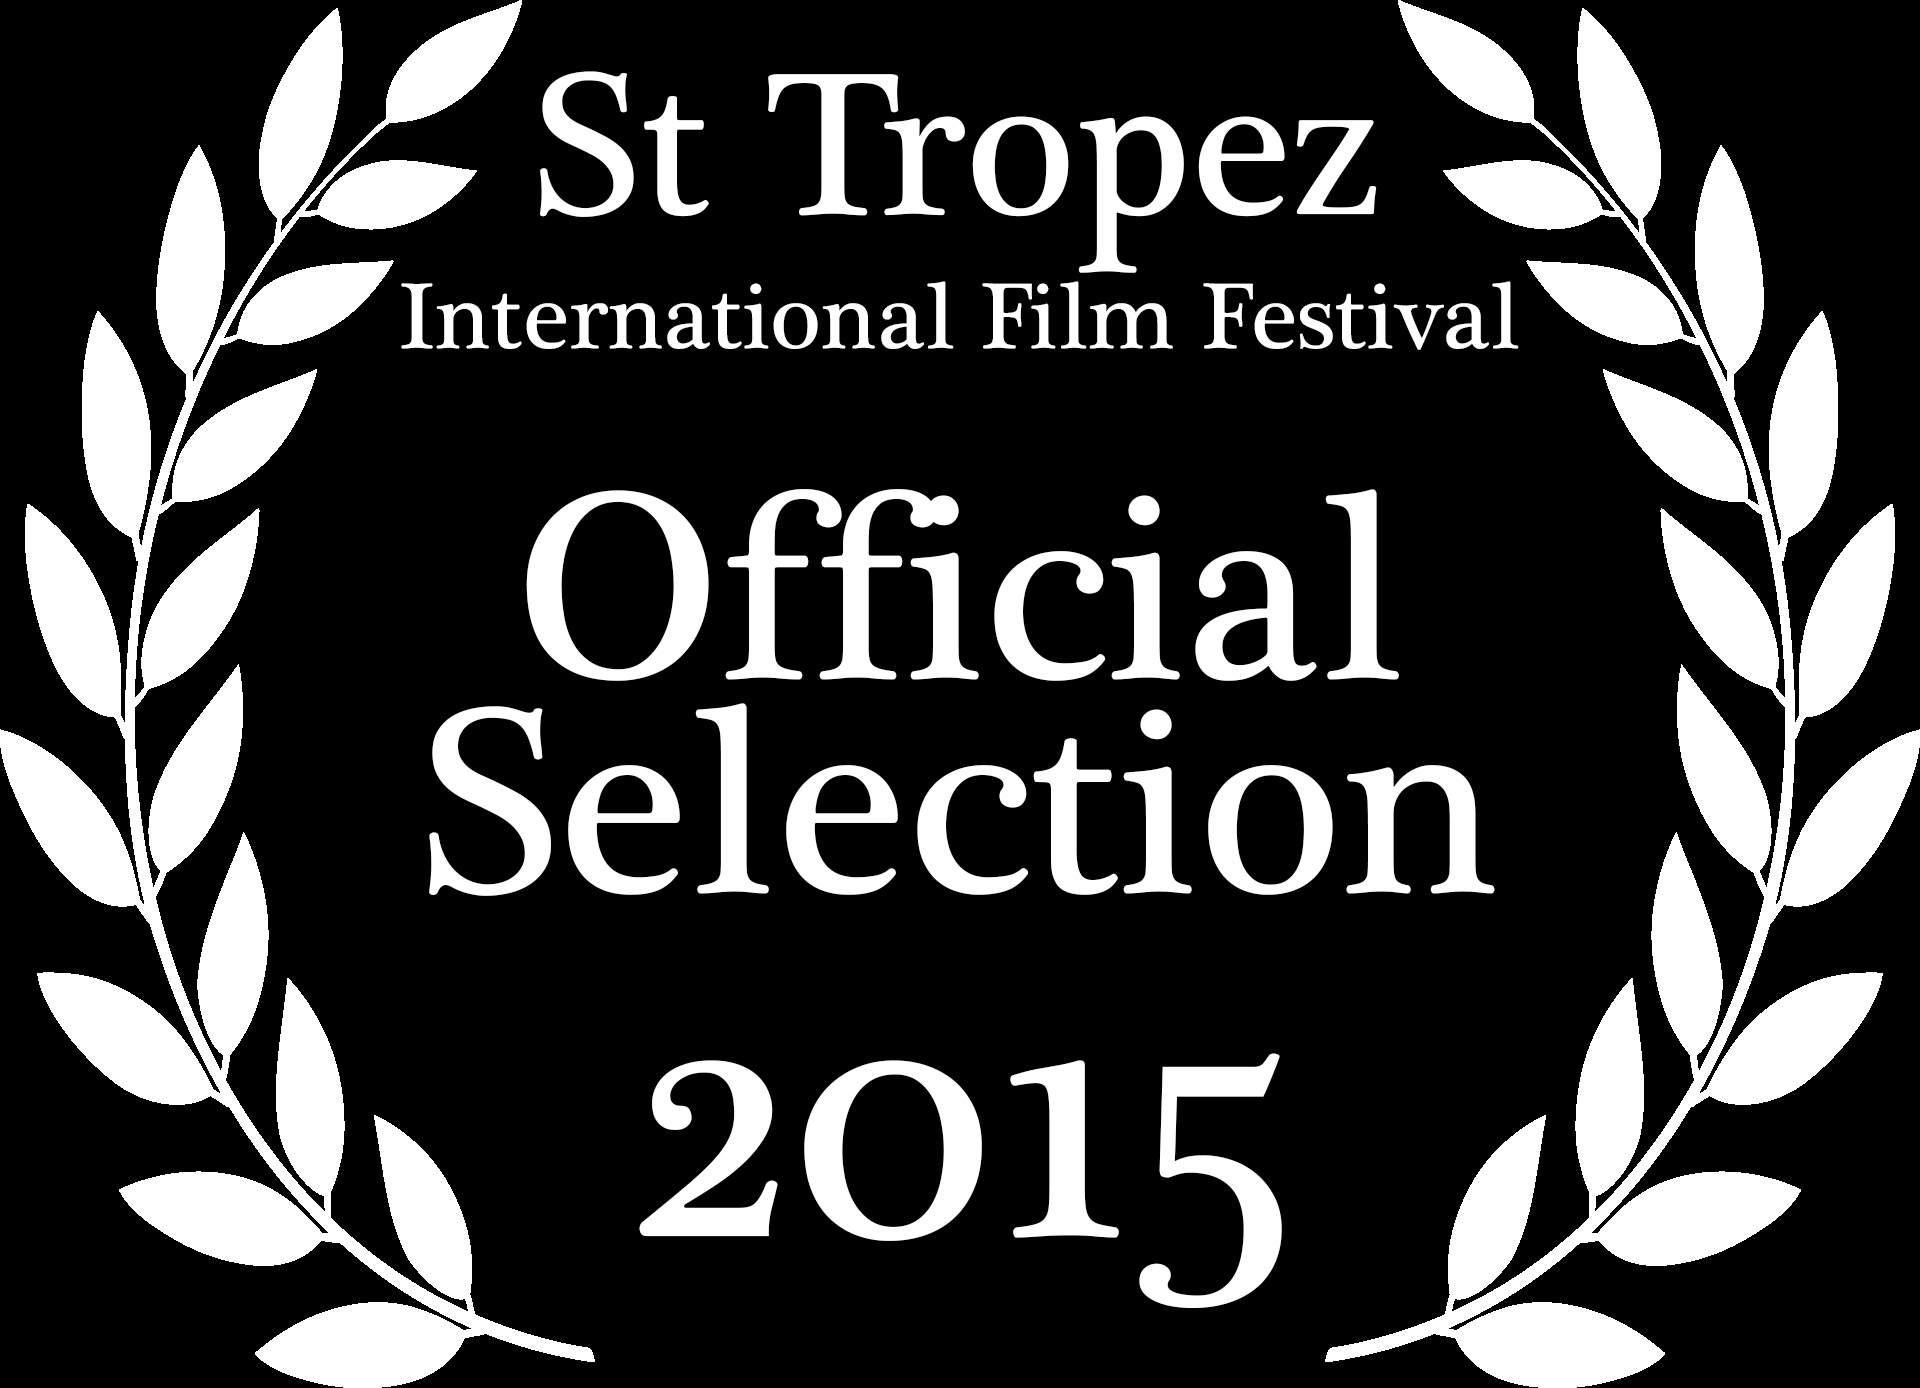 St Tropez International Film Festival Official Selection 2015